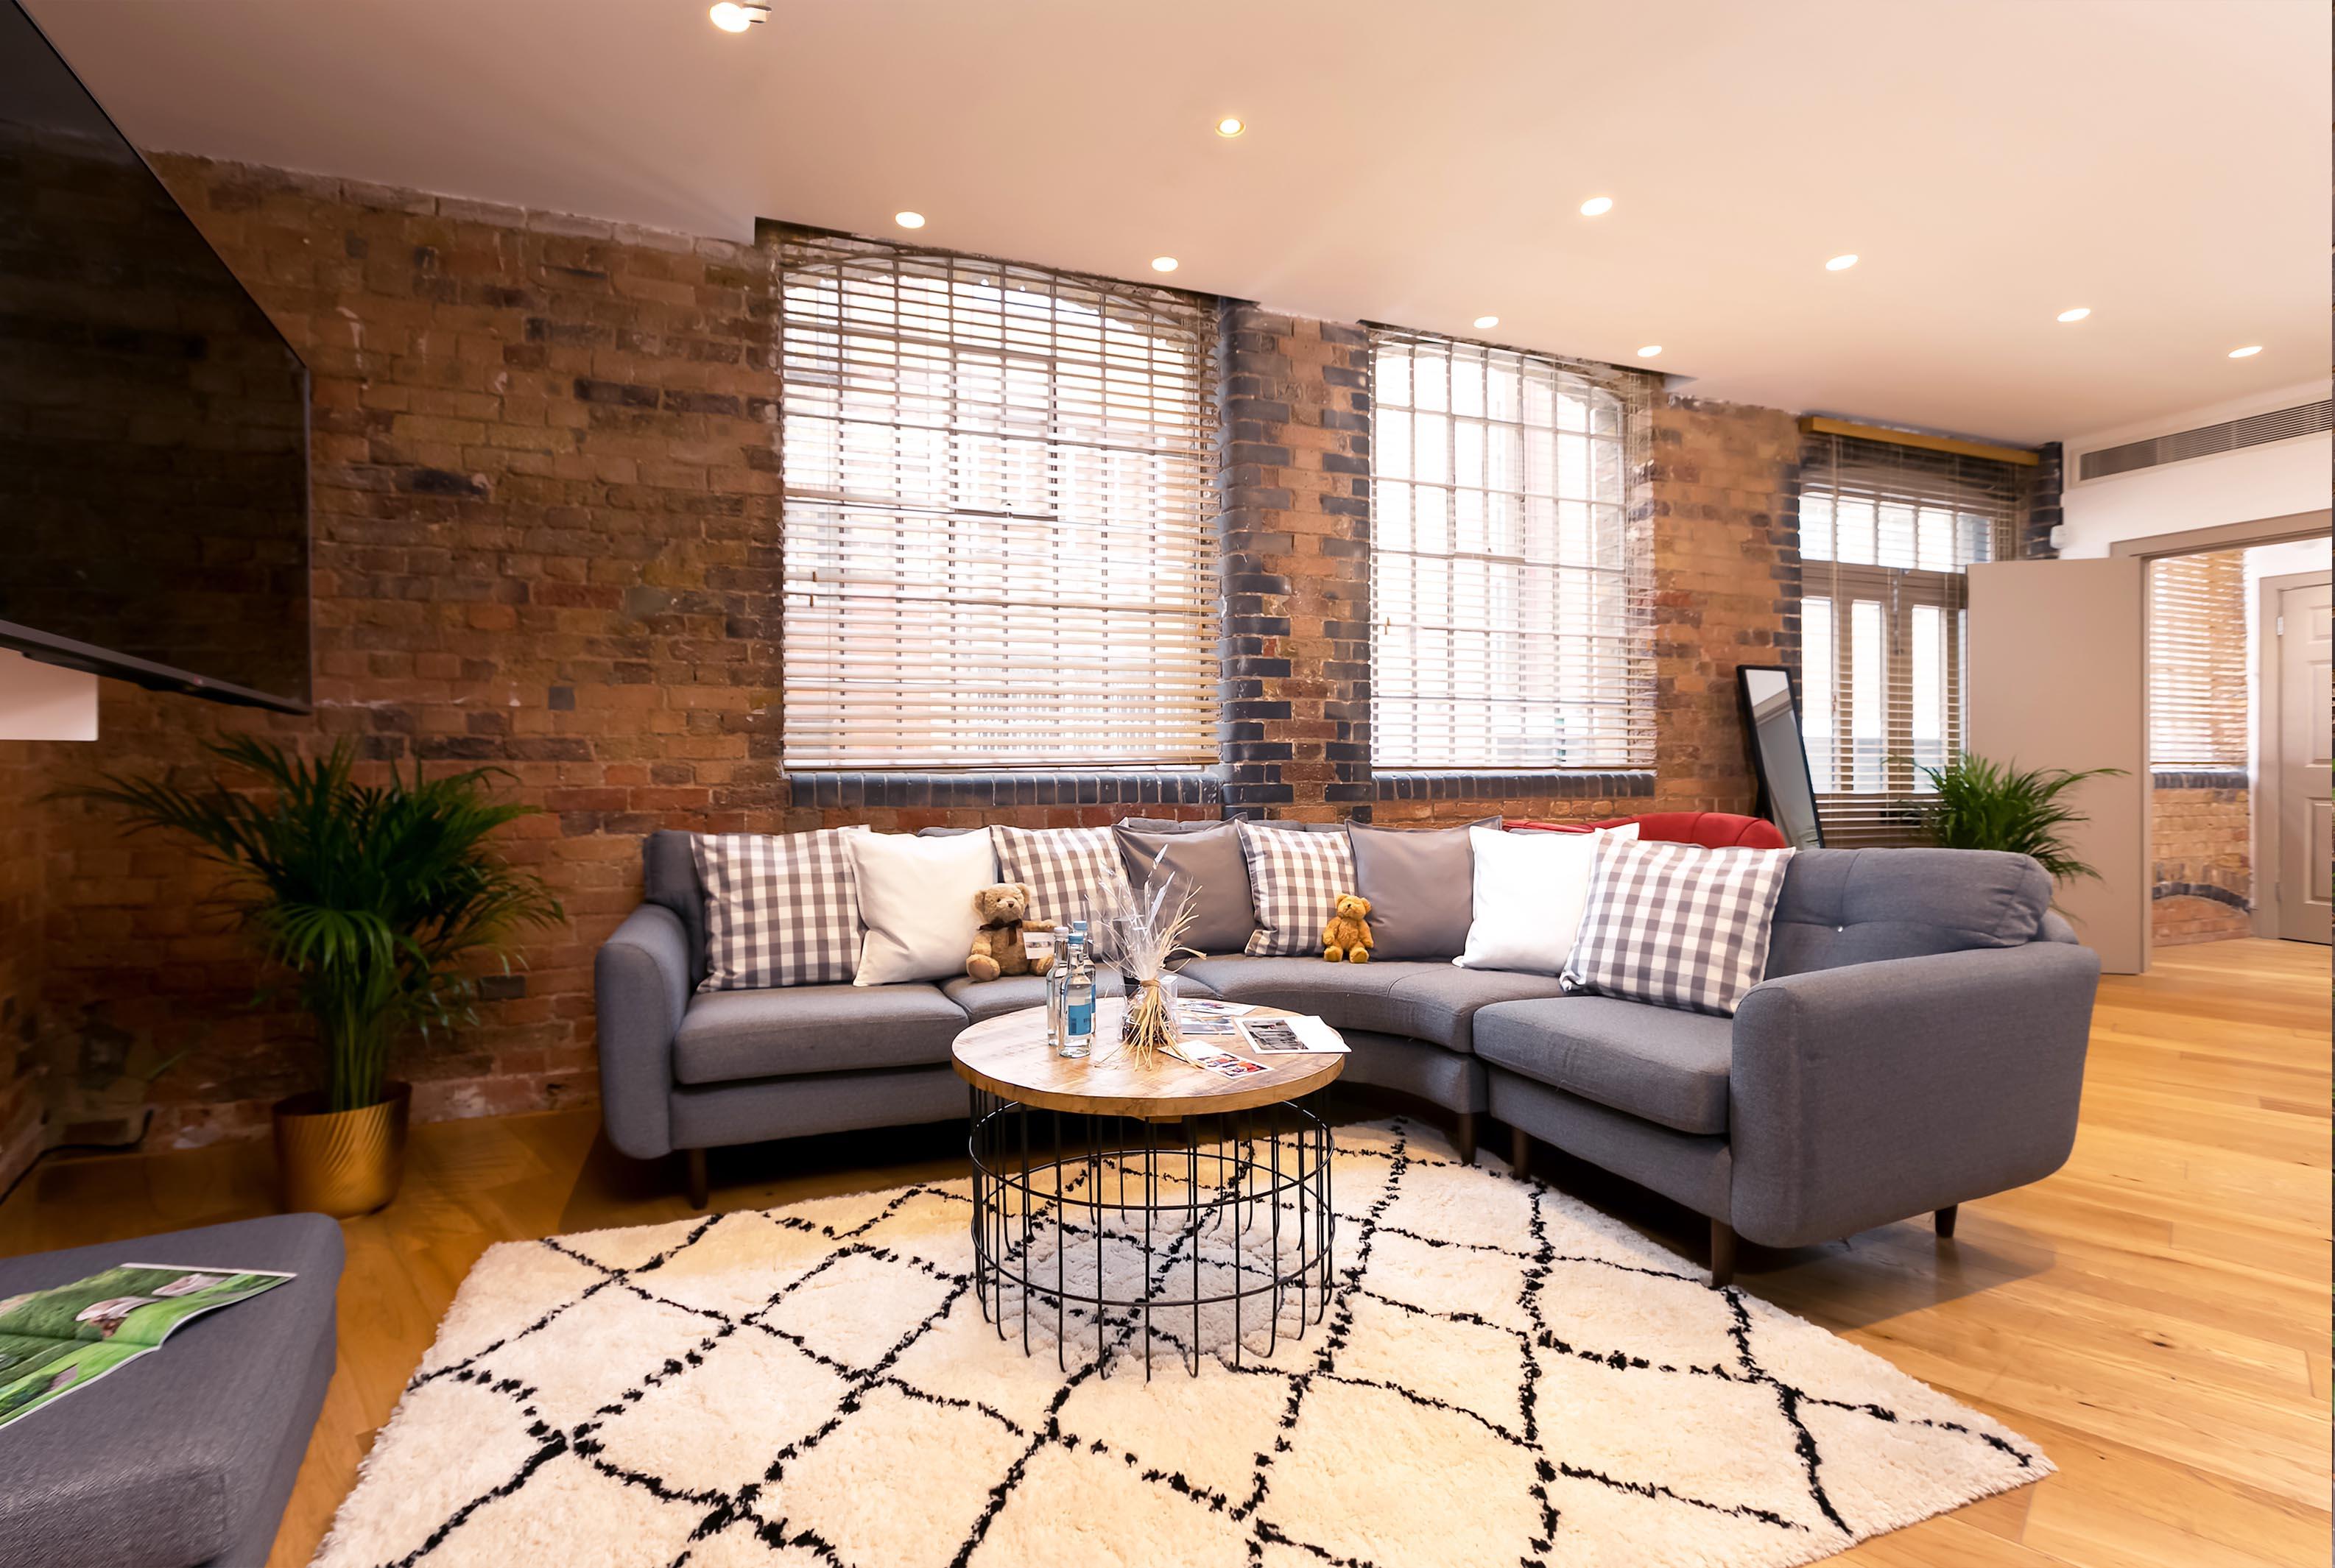 Lovelydays luxury service apartment rental - London - Fitzrovia - Wells Mews B - Lovelysuite - 2 bedrooms - 2 bathrooms - Comfortable sofa - 2211ca9034b9 - Lovelydays